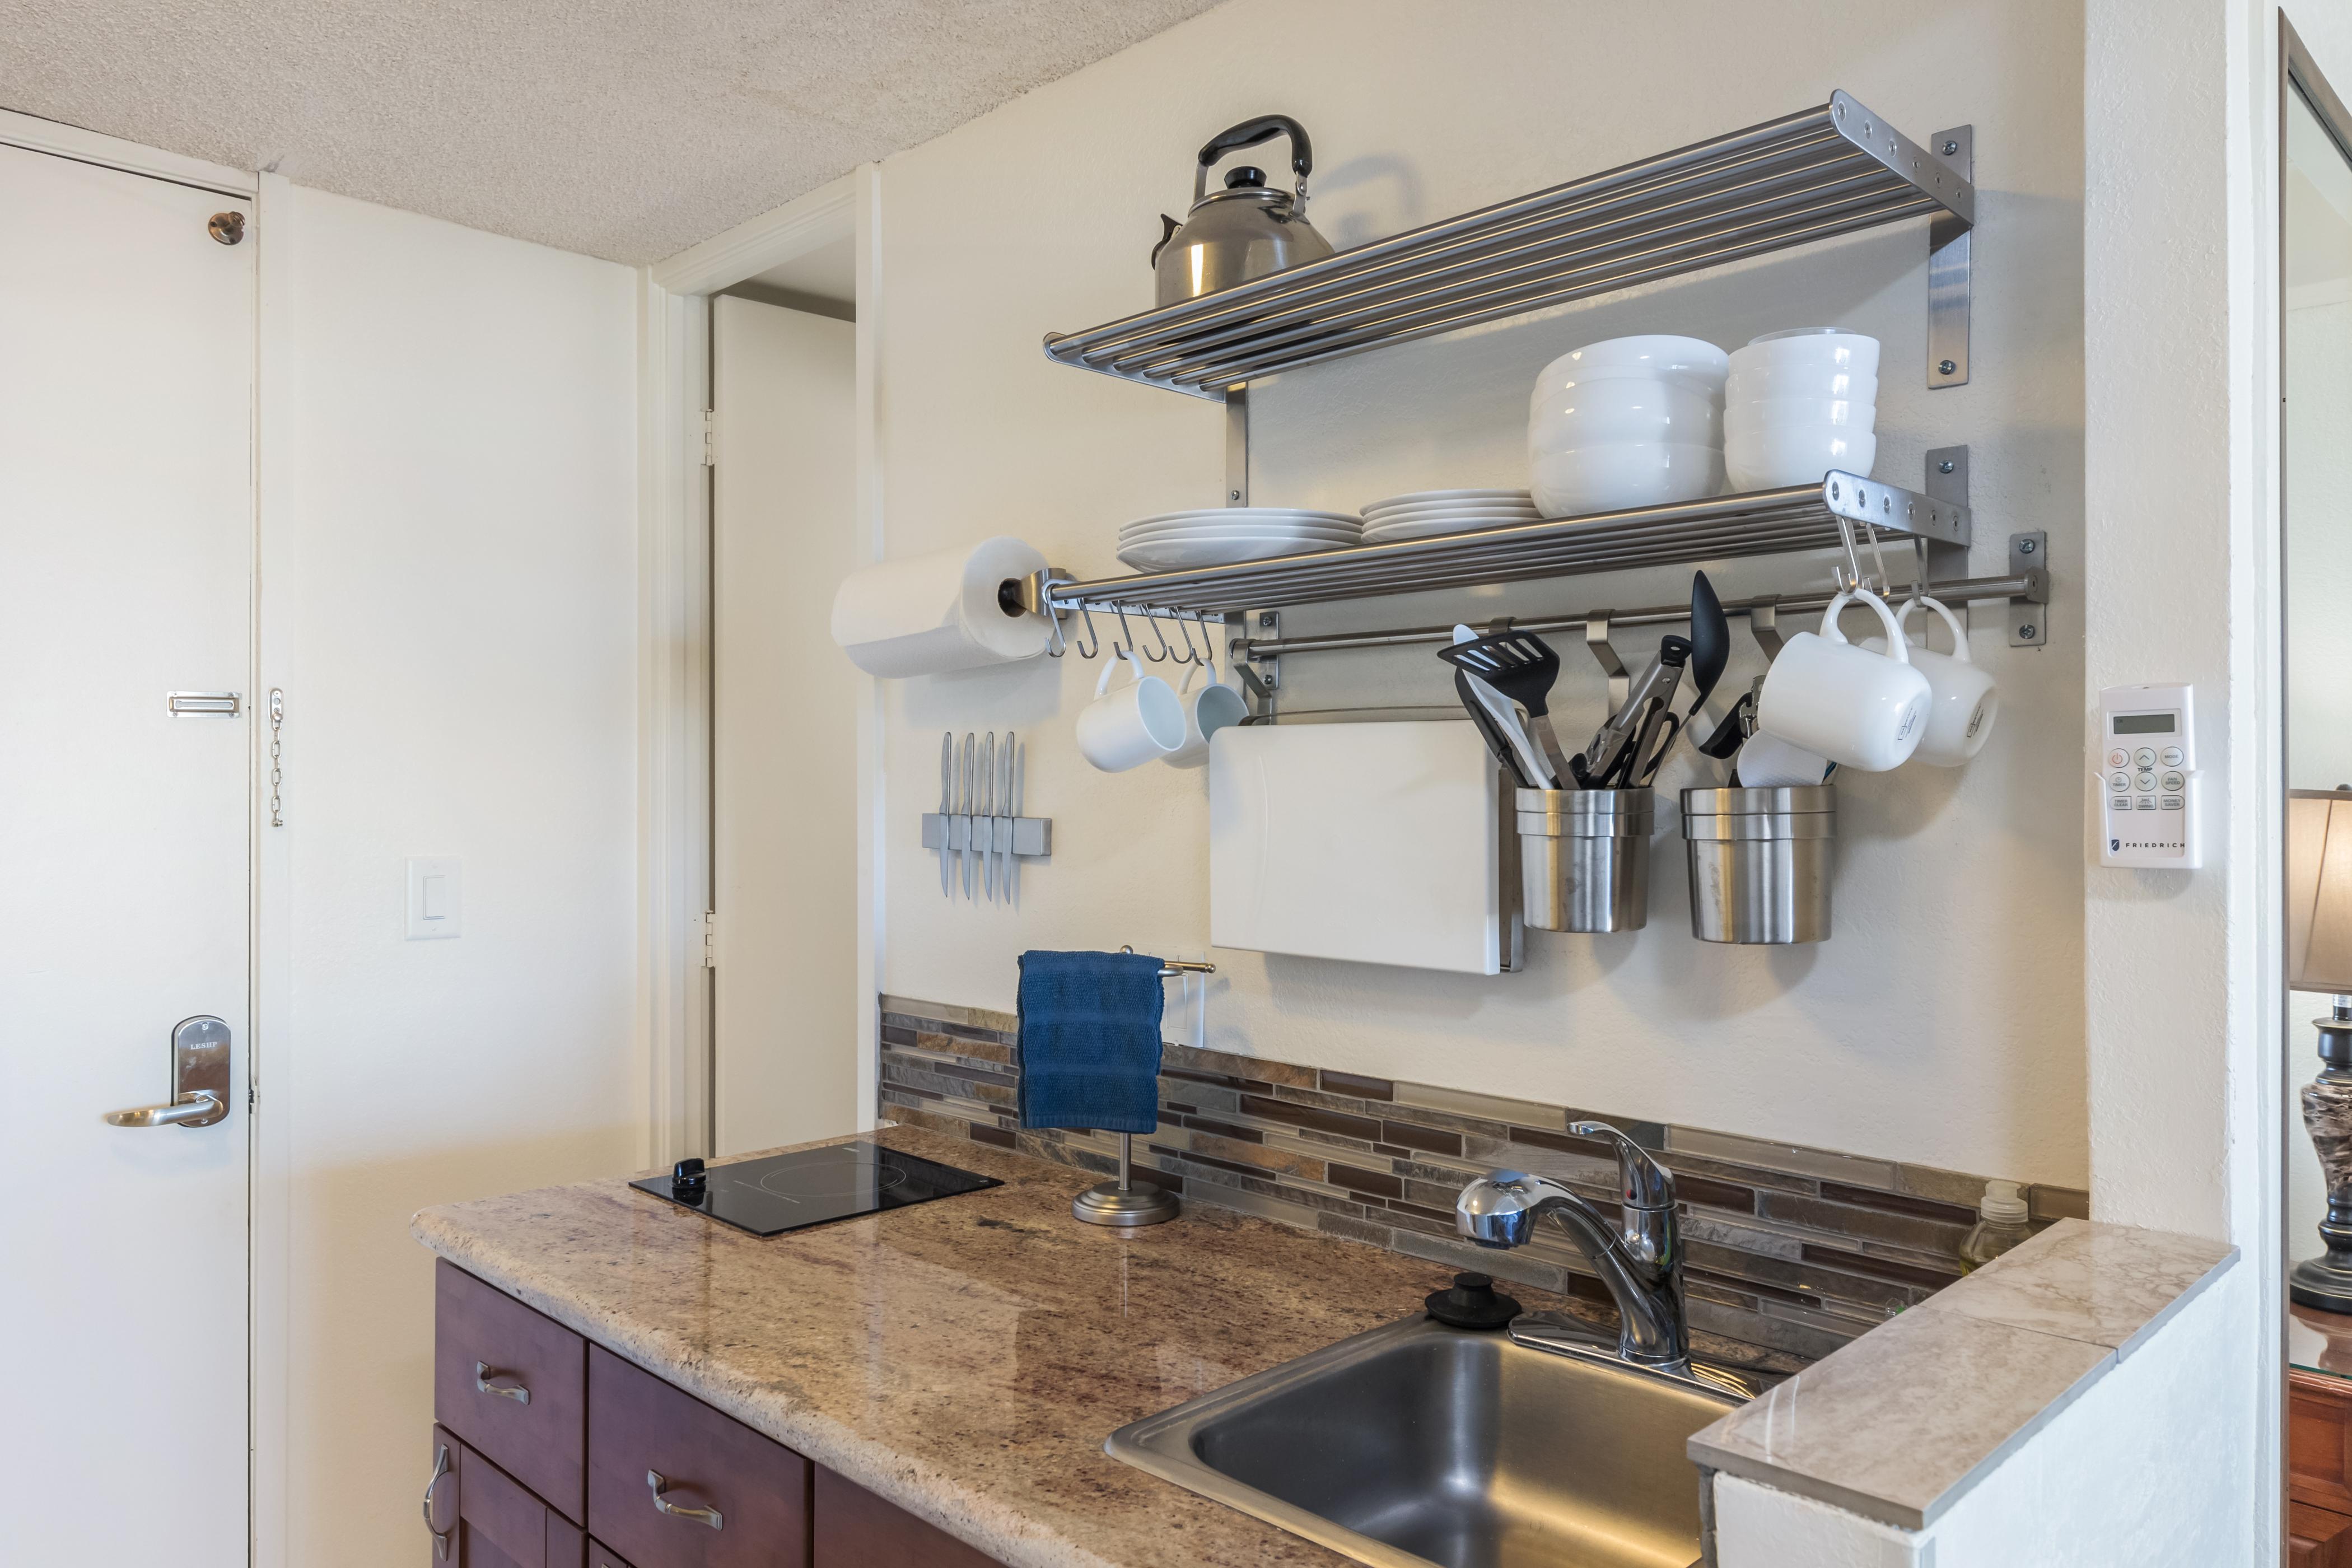 Contemporary Kitchenette W/Single Burner Stove